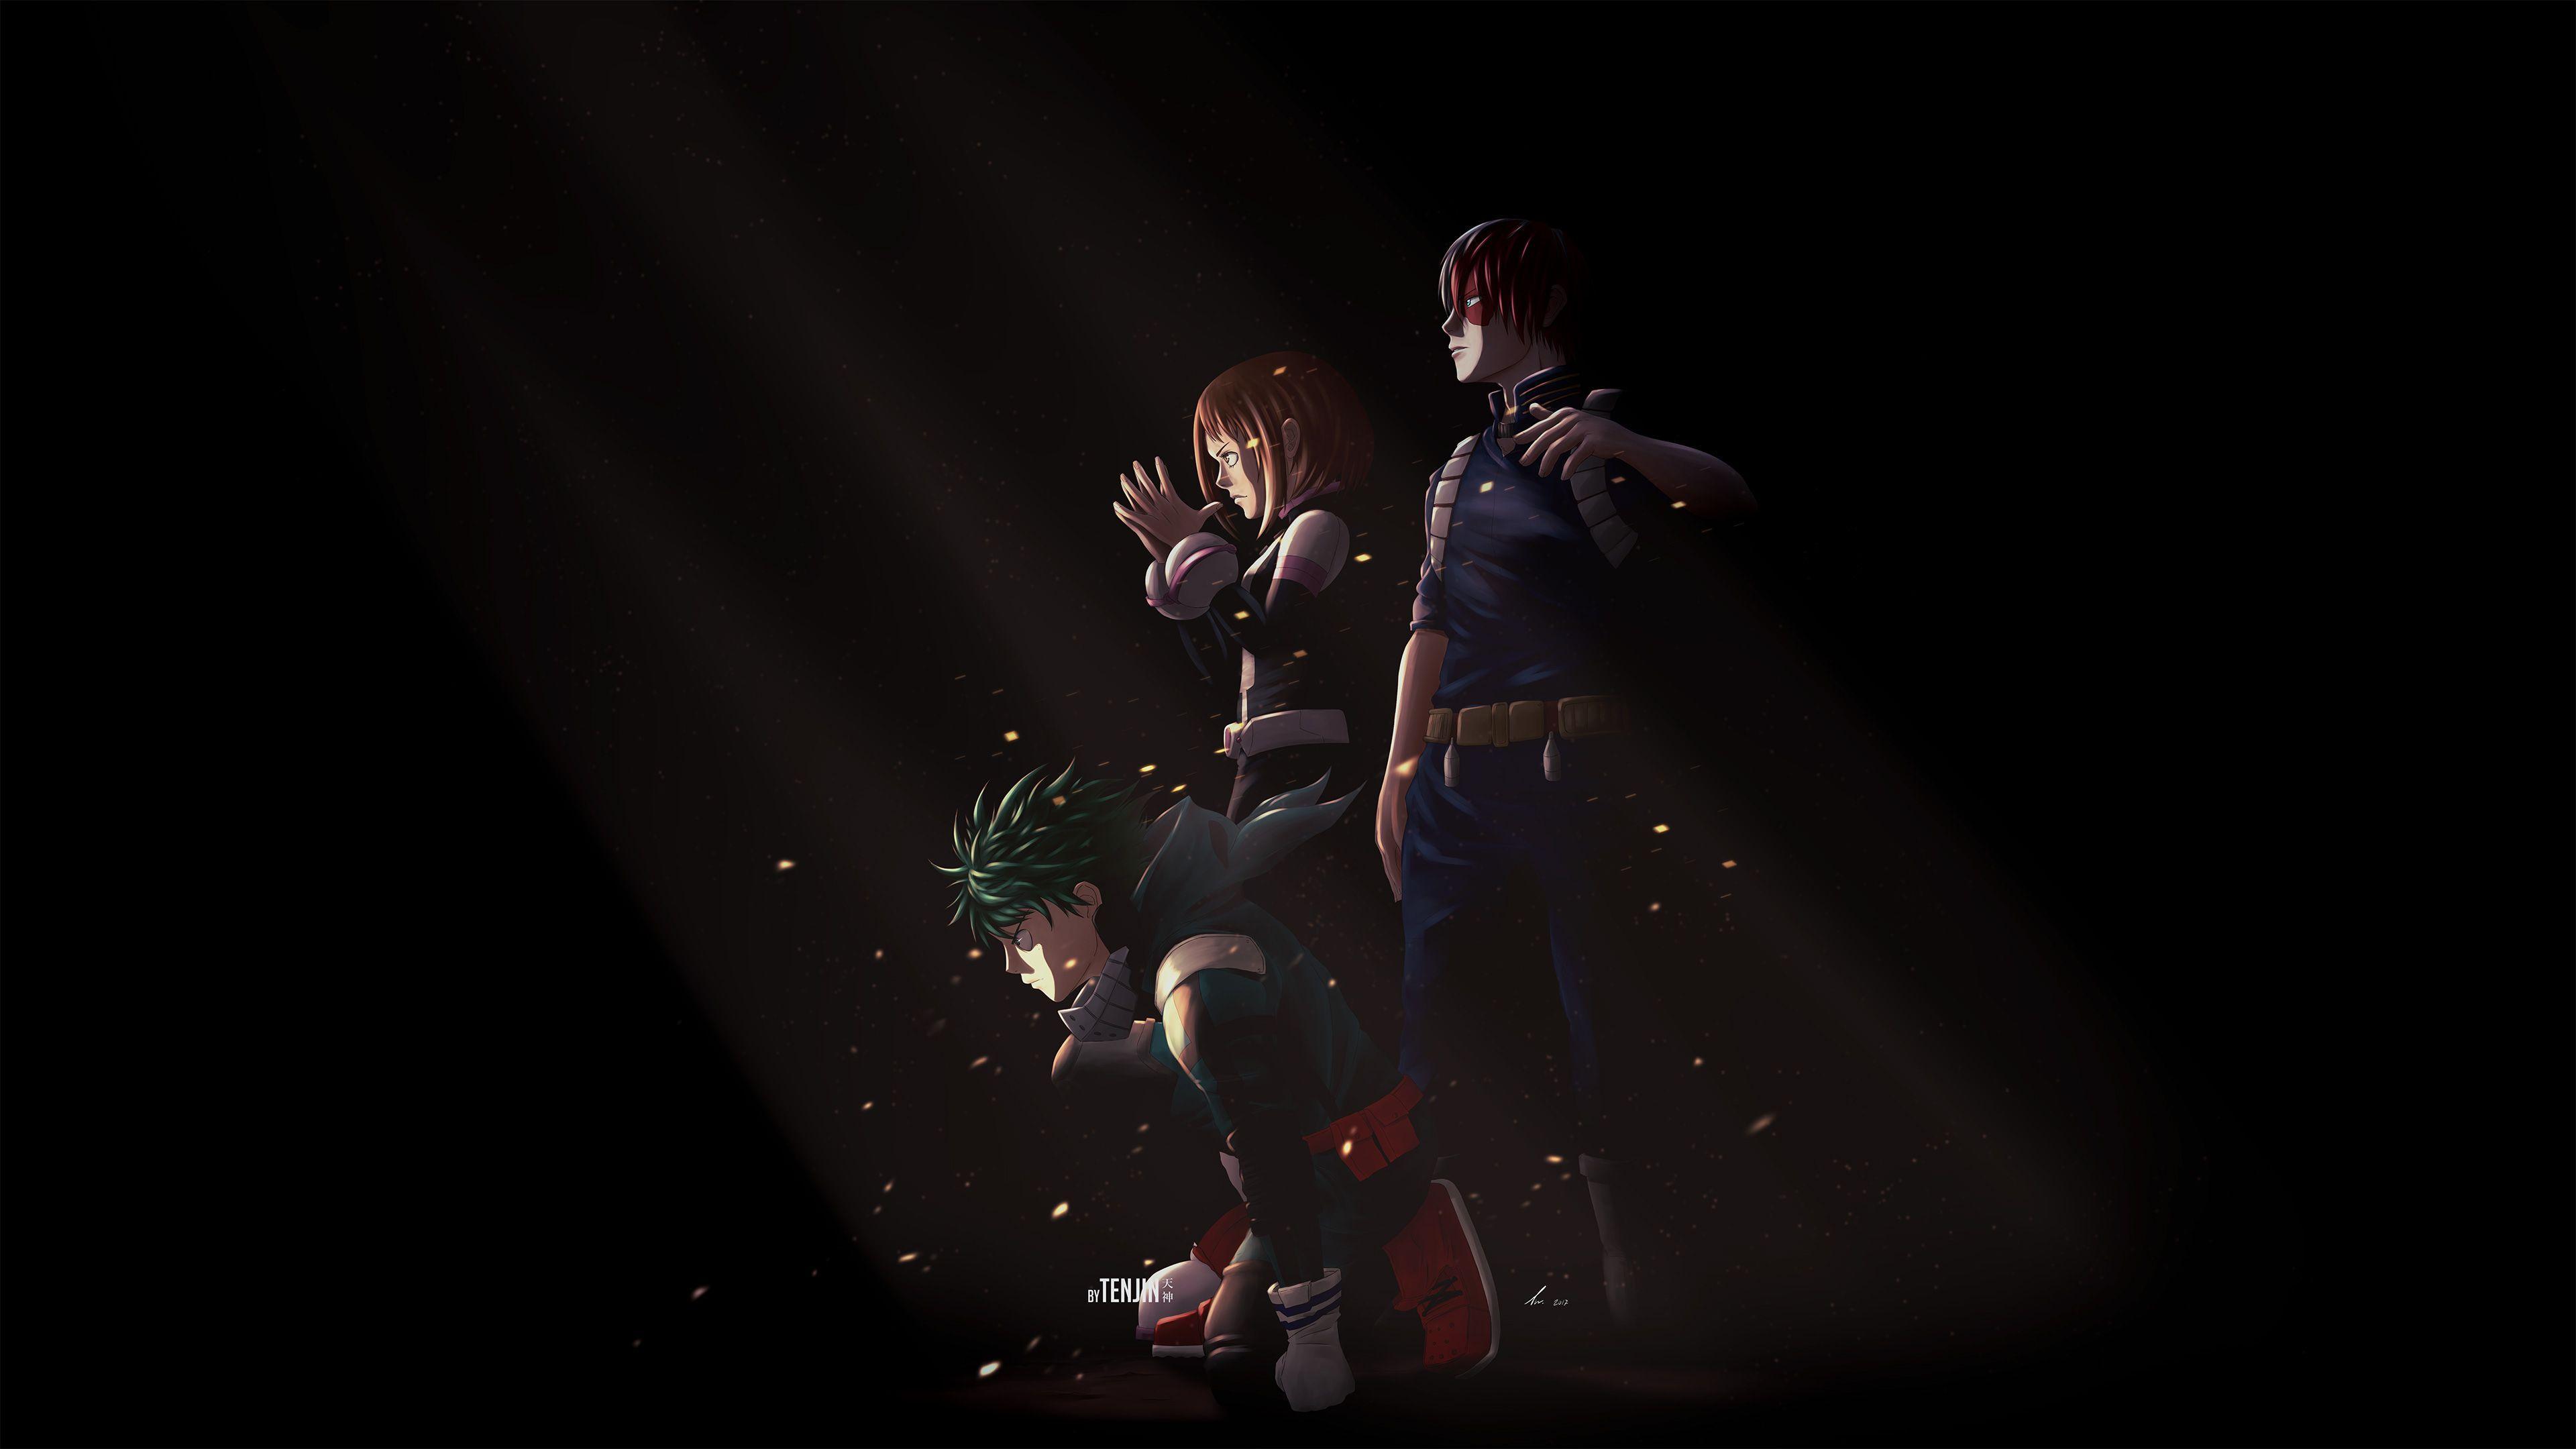 3840x2160 Uraraka Deku Shouto Todoroki My Hero Academia, HD Anime, 4k